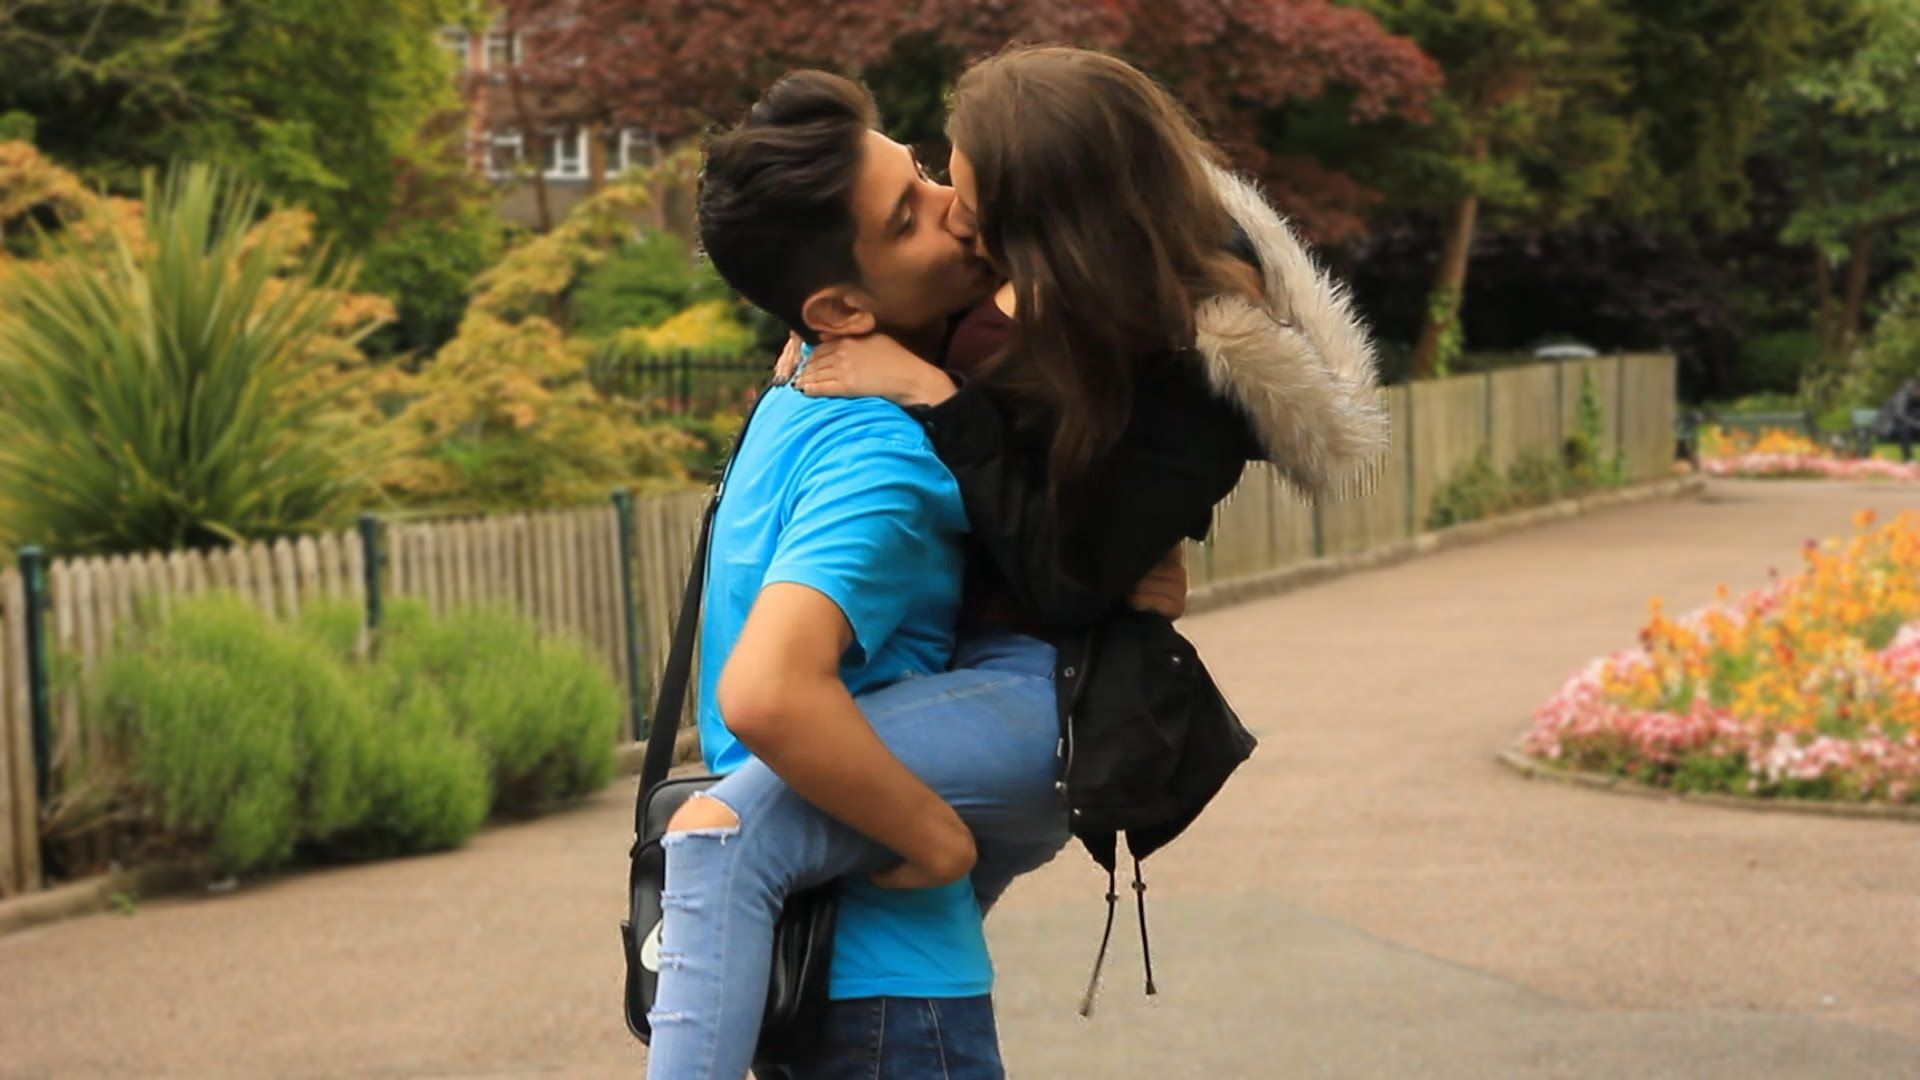 Women kissing mobile videos hairy